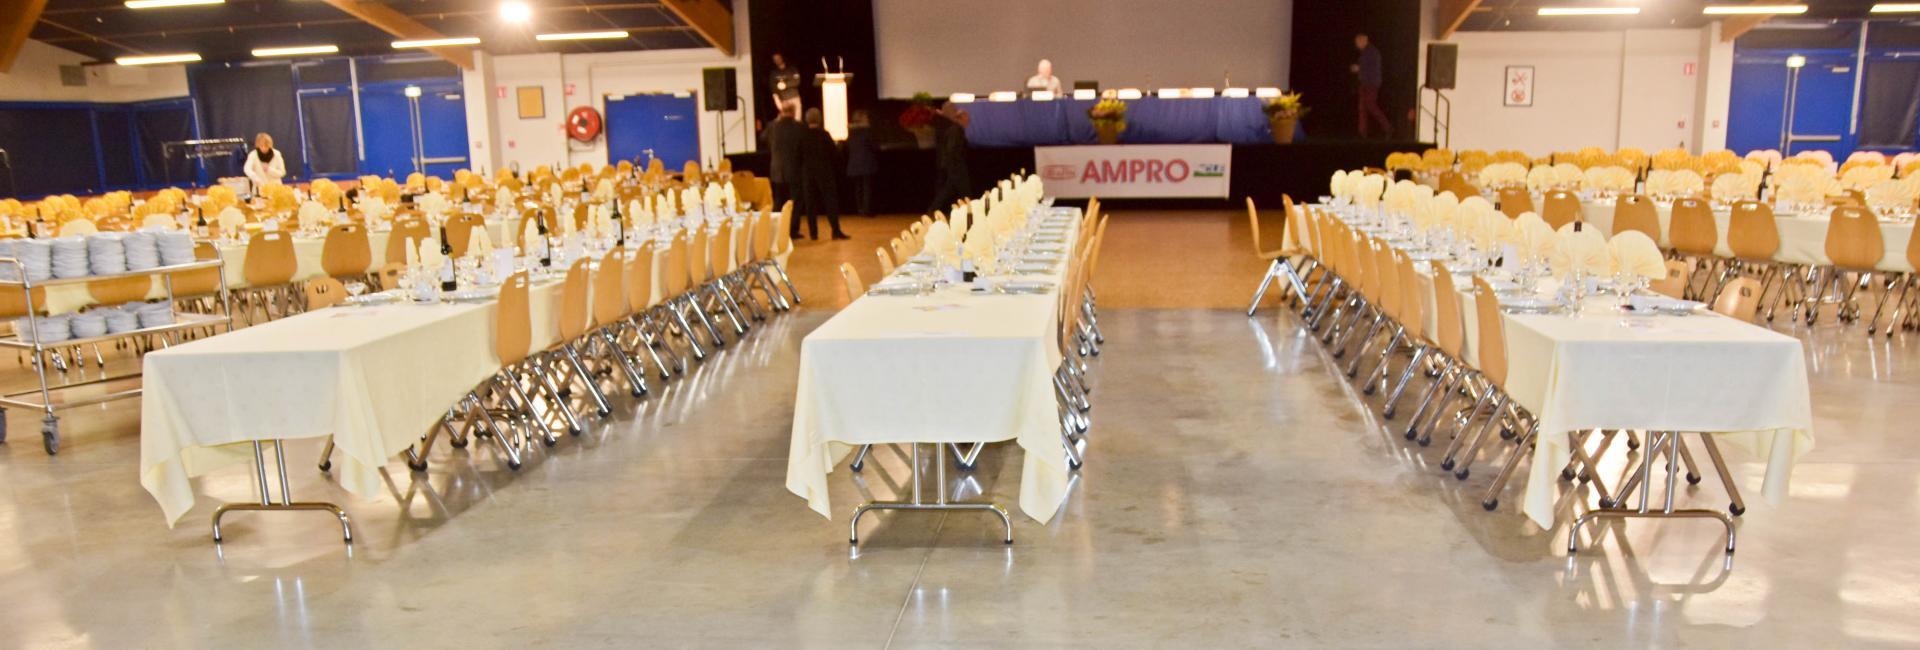 AG ampro - (040)